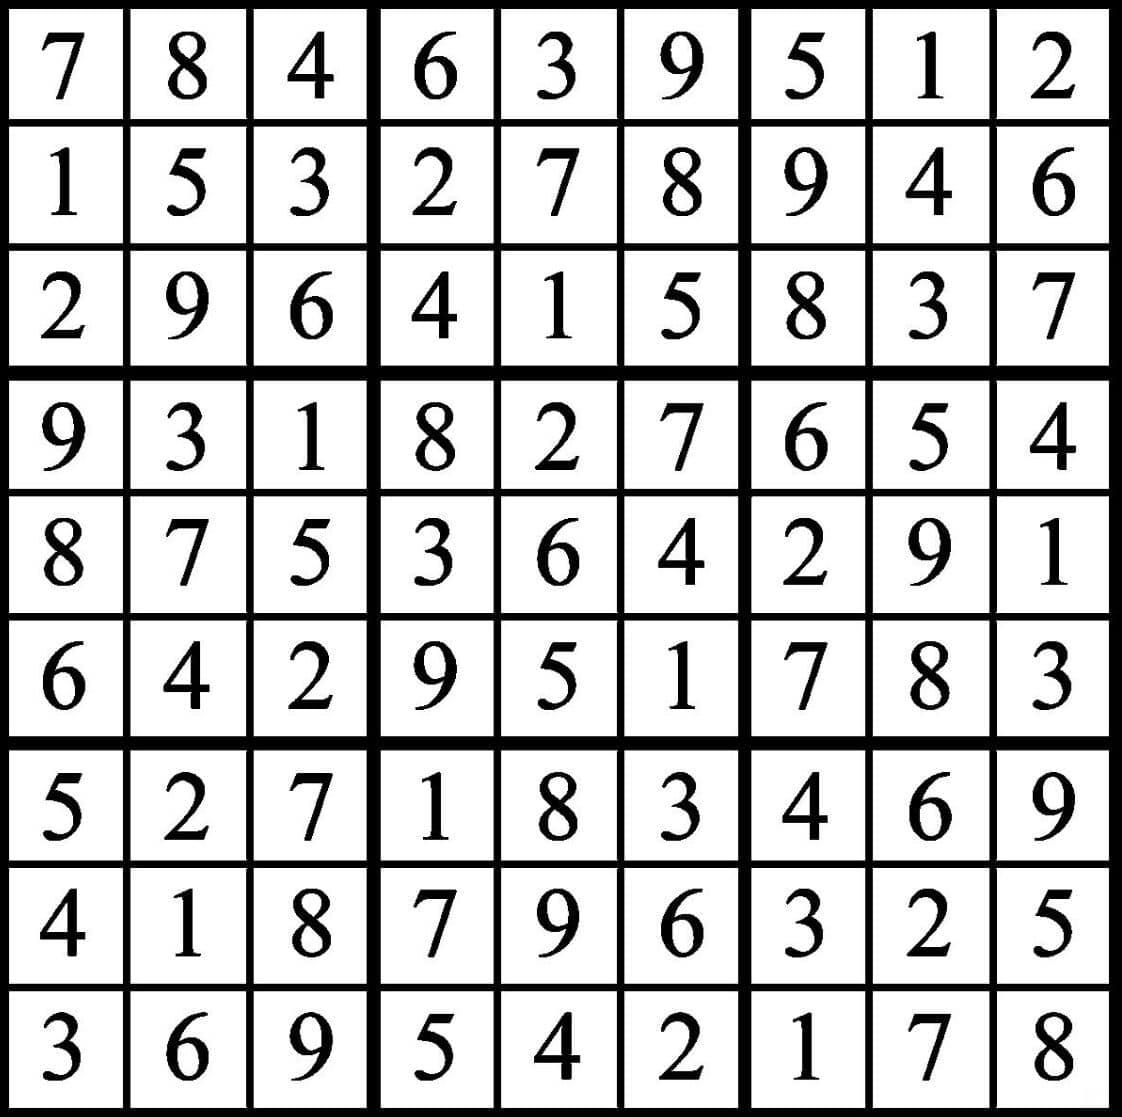 Sudoku 2017 Rules